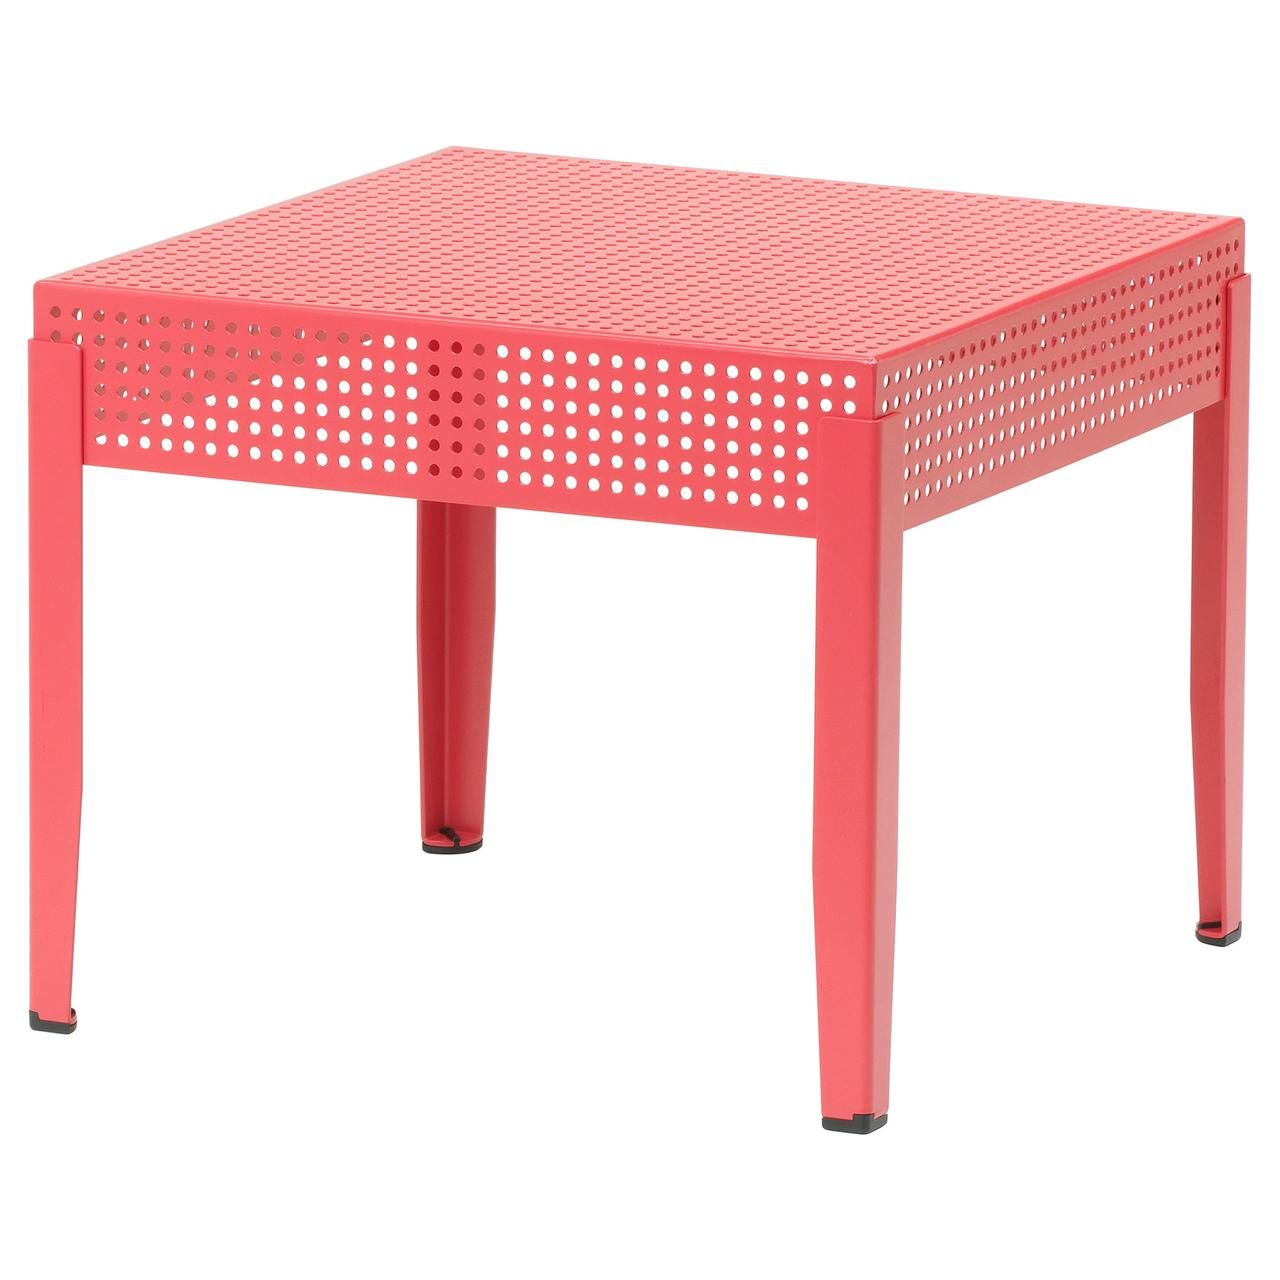 Столик IKEA SJÄLVSTÄNDIG 51x51 см розовый 504.149.36